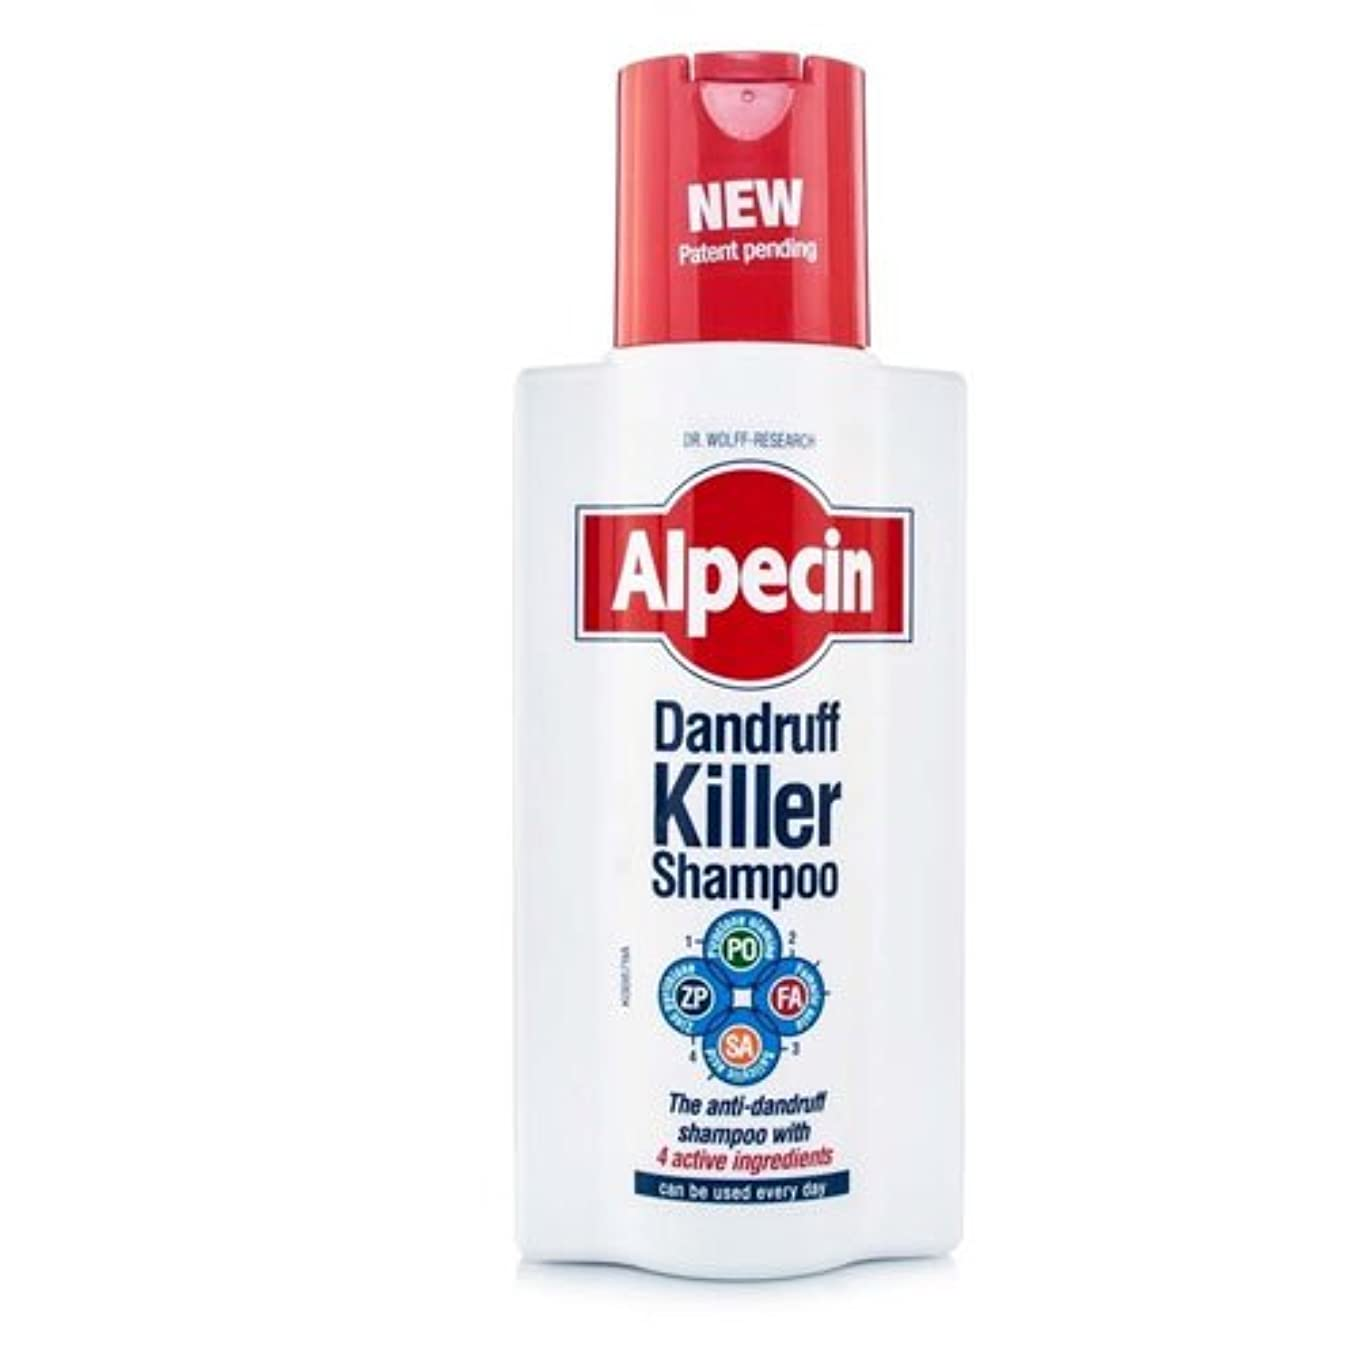 告発編集者結婚Alpecin Dandruff Killer Shampoo 250 ml by Alpecin [並行輸入品]